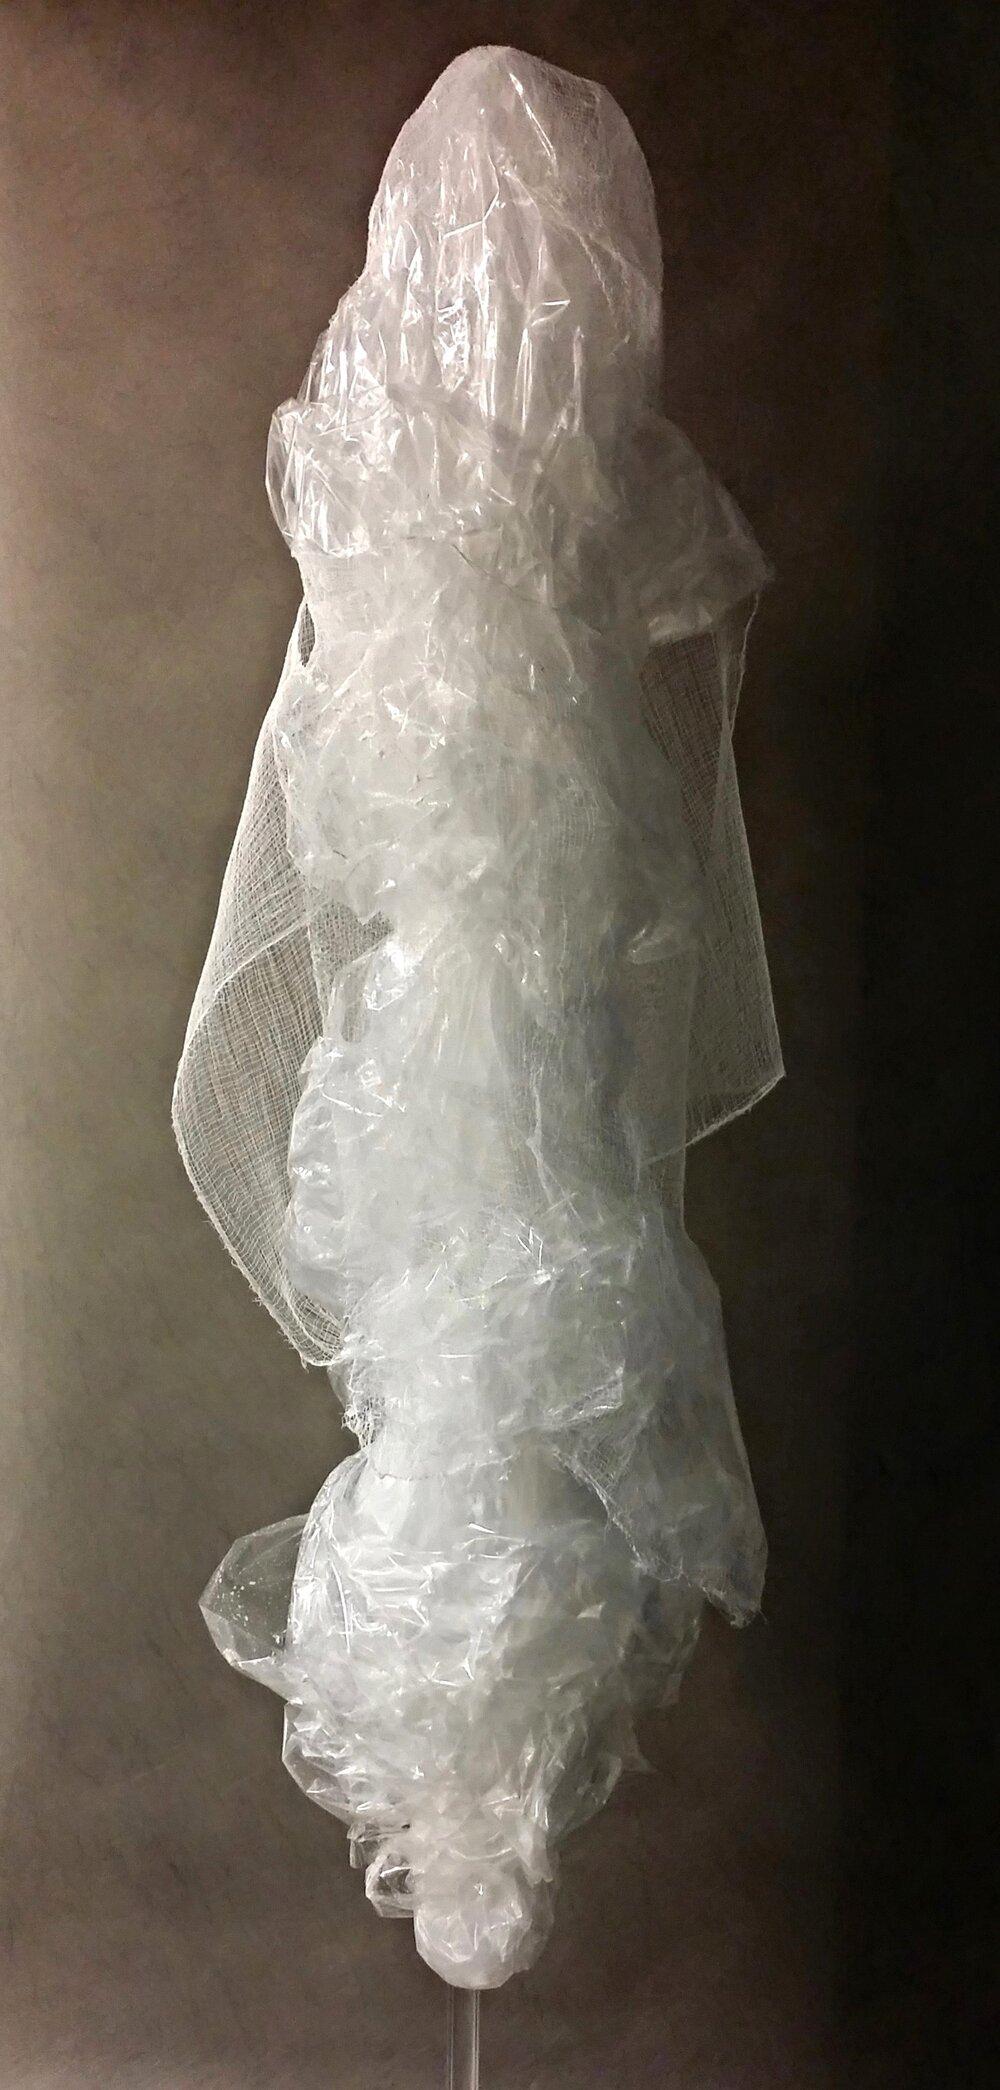 I, The King, 2016  80 x 20 x 18 inches  Plastic film, gauze, tulle, nylon thread,white glue, plexiglass tube on wood base